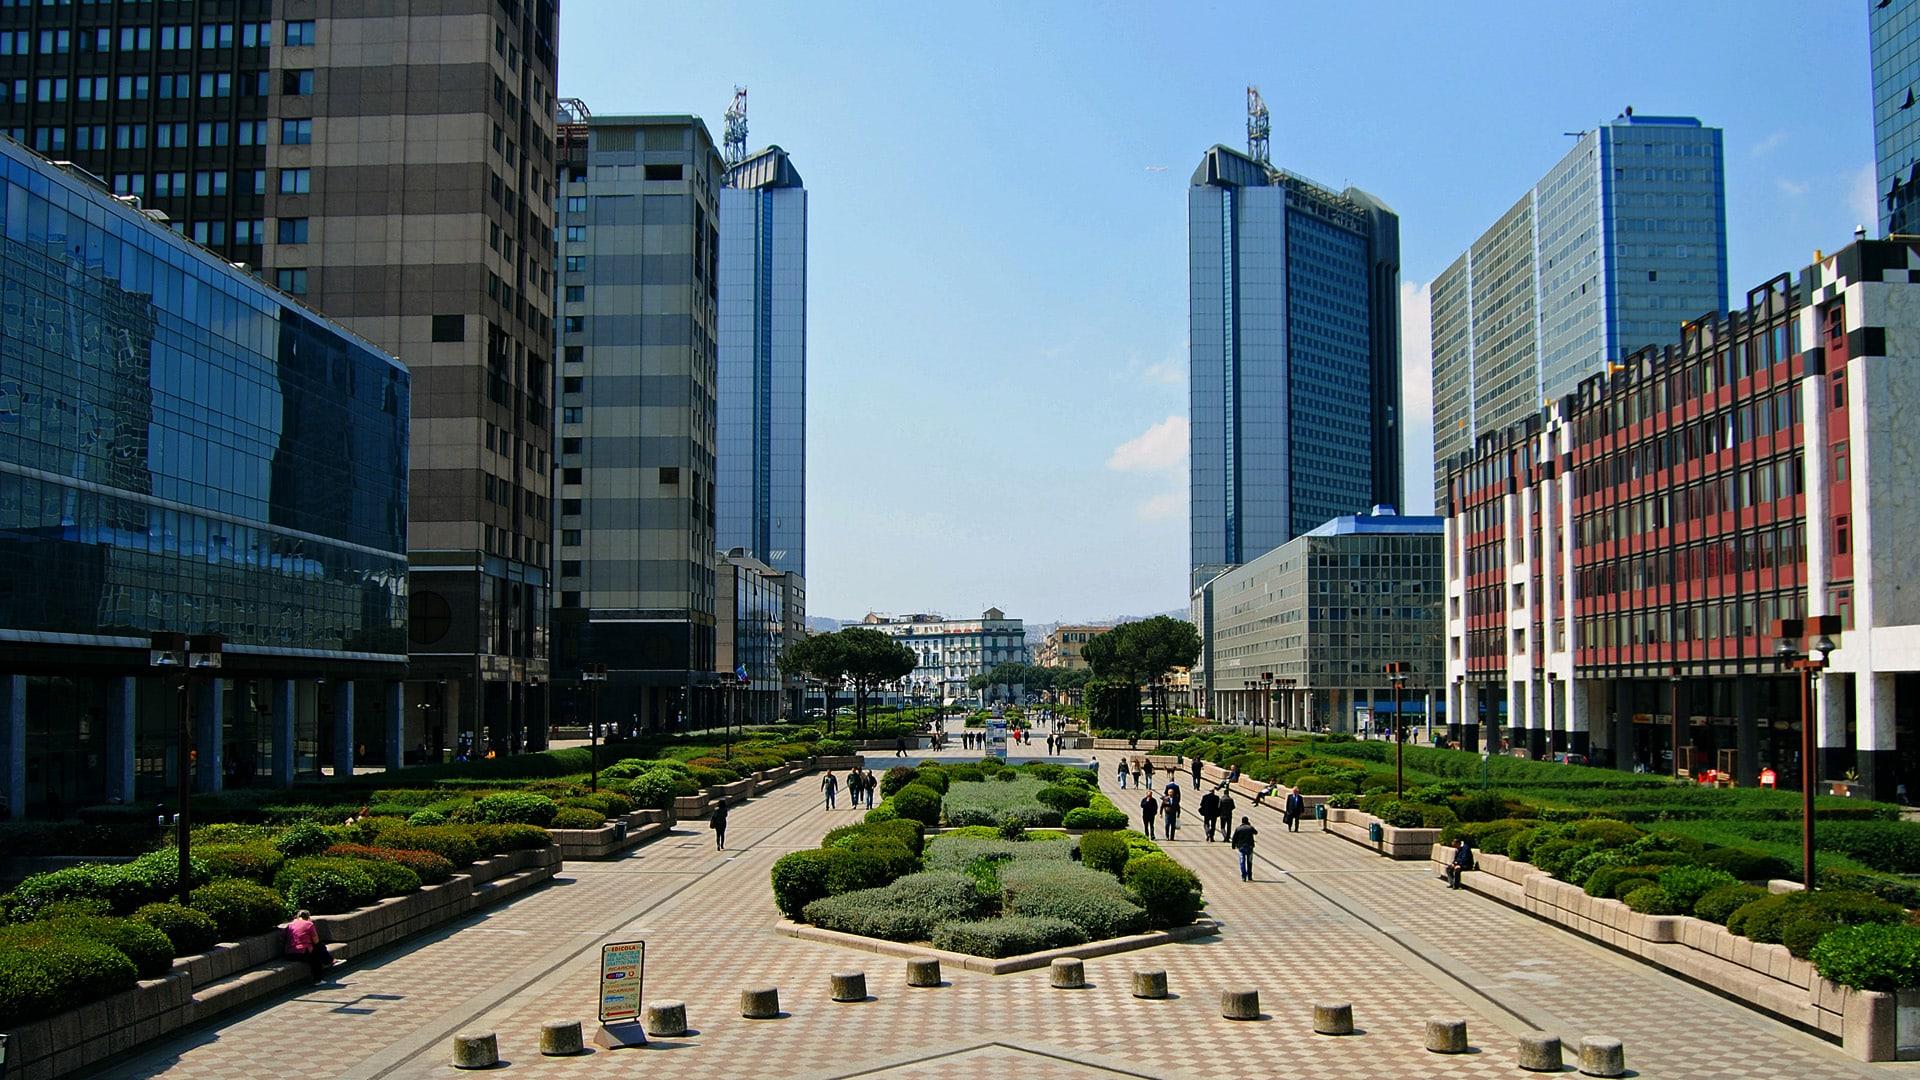 Bengaluru world's fastest growing tech hub, London second: Report